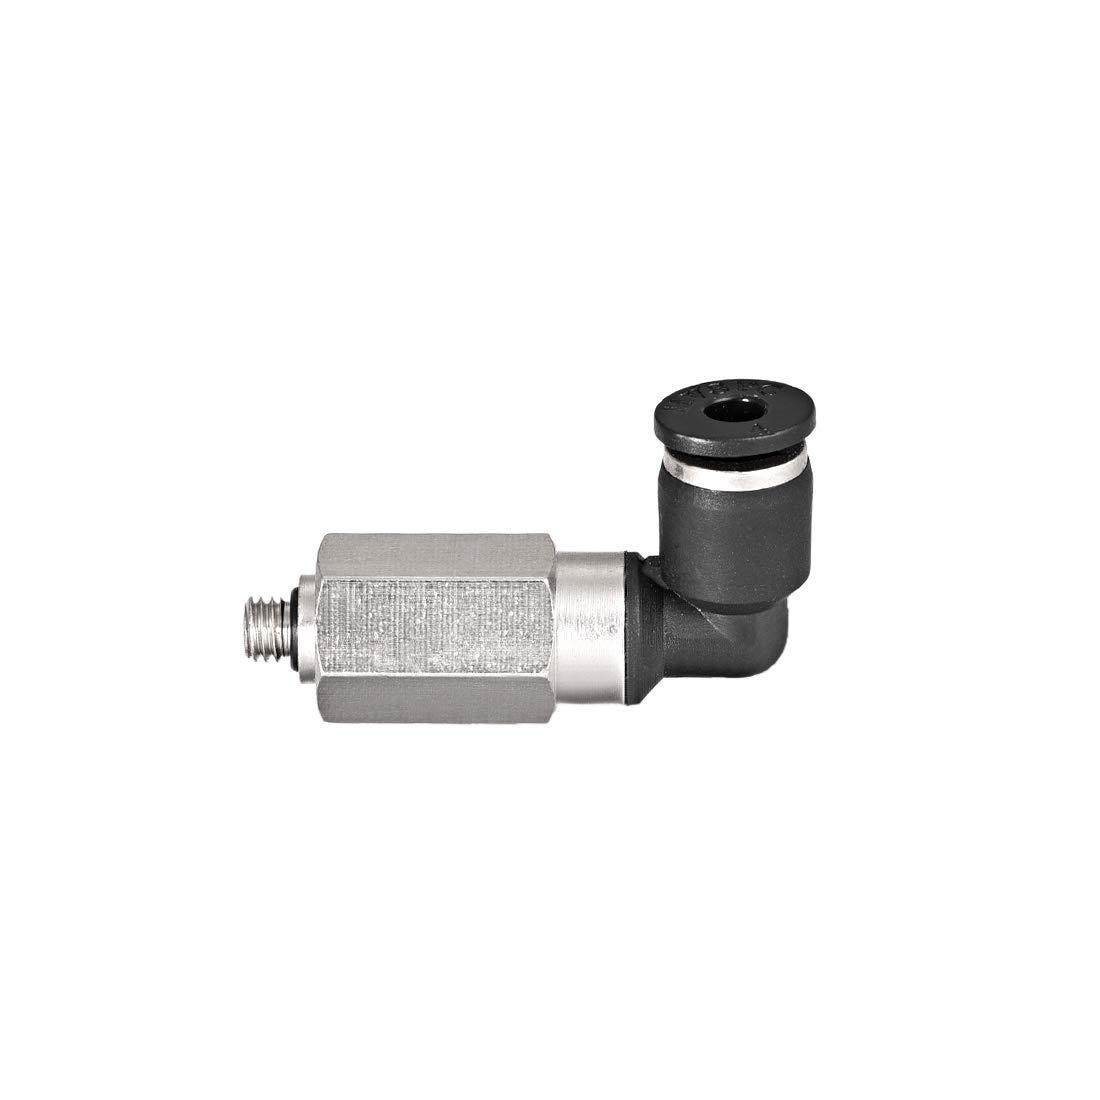 uxcell 4mm Tube to M5 Push Lock Elbows L Shape Air Fittings 3pcs